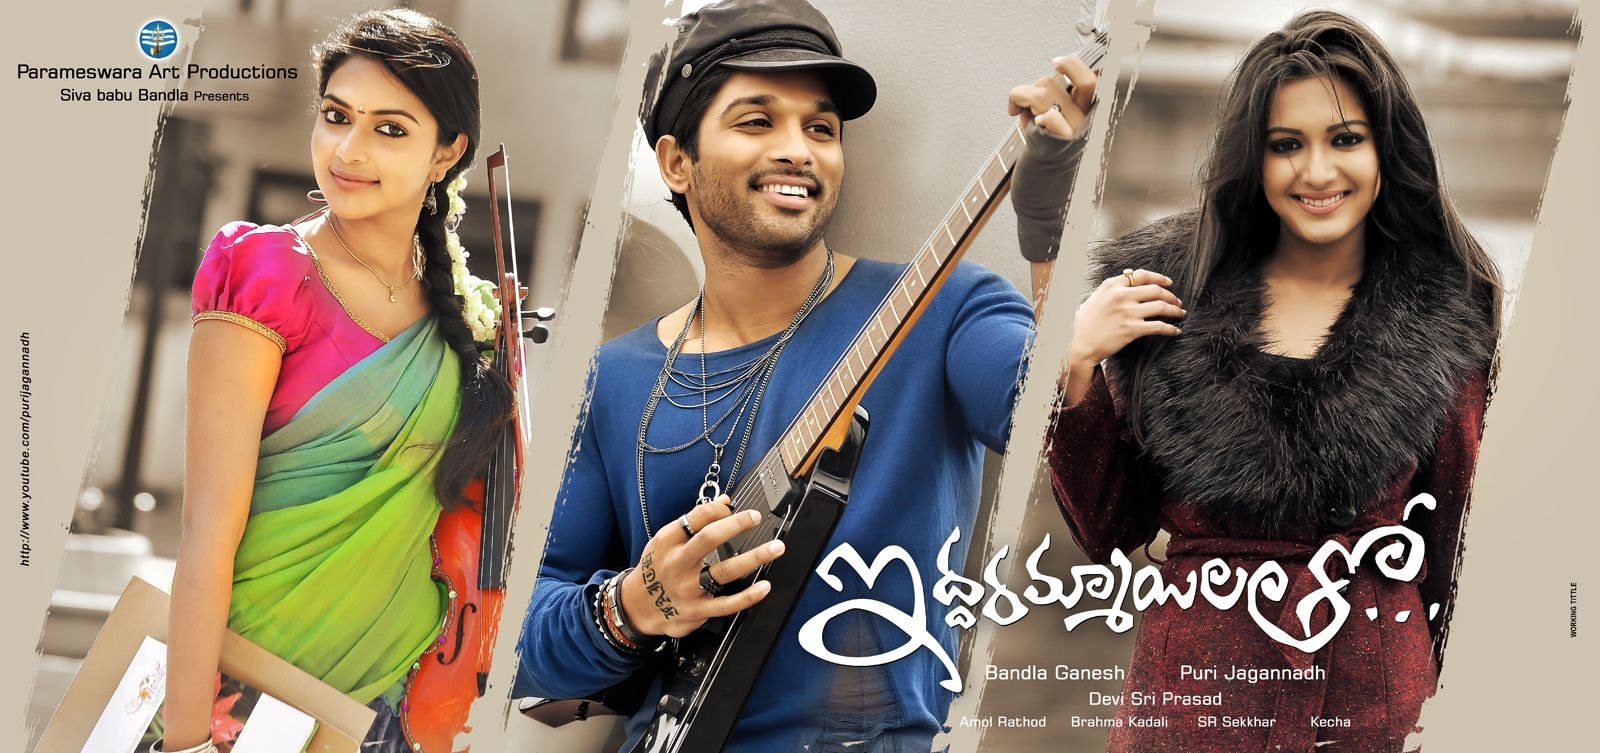 Allu Arjun S Iddarammayilatho Telugu Movie Latest Hd Posters And Wallpapers Are Released On May 17 Http Pjmaja Blogspot I Amala Paul Movie Wallpapers Movies